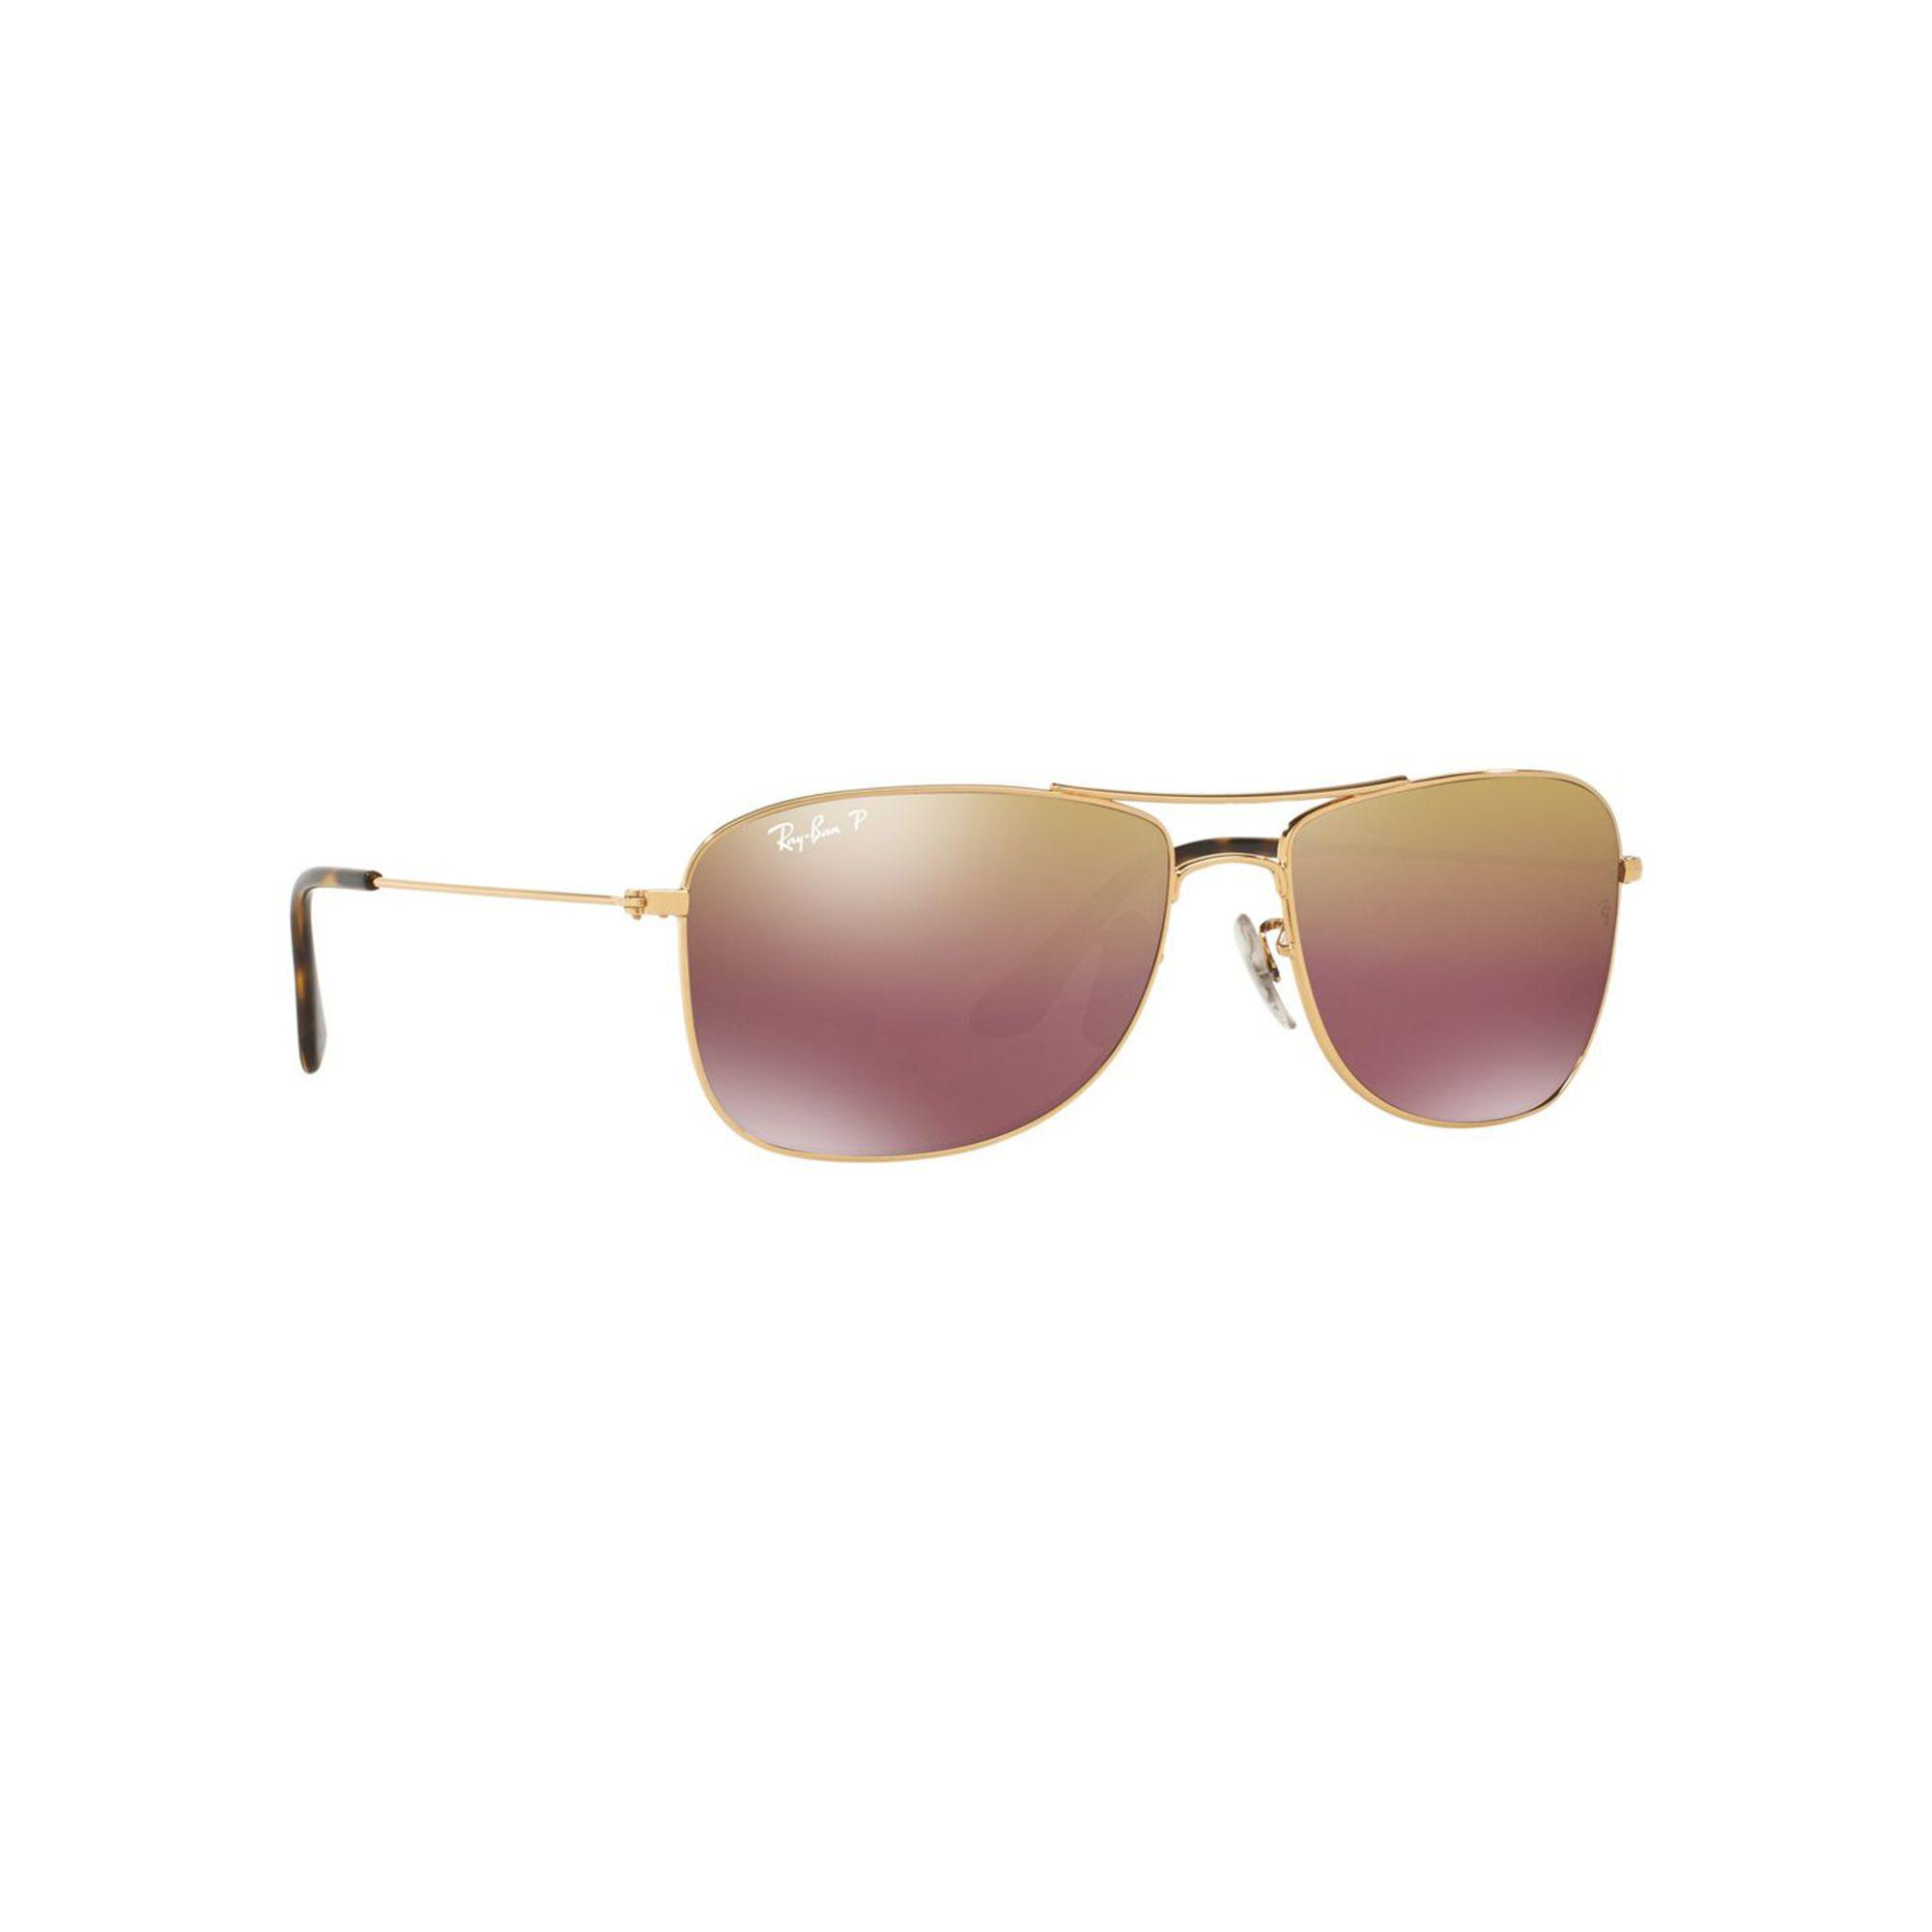 d5f2b58726 Ray-Ban Gold Rb3543 Pilot Sunglasses in Metallic for Men - Lyst